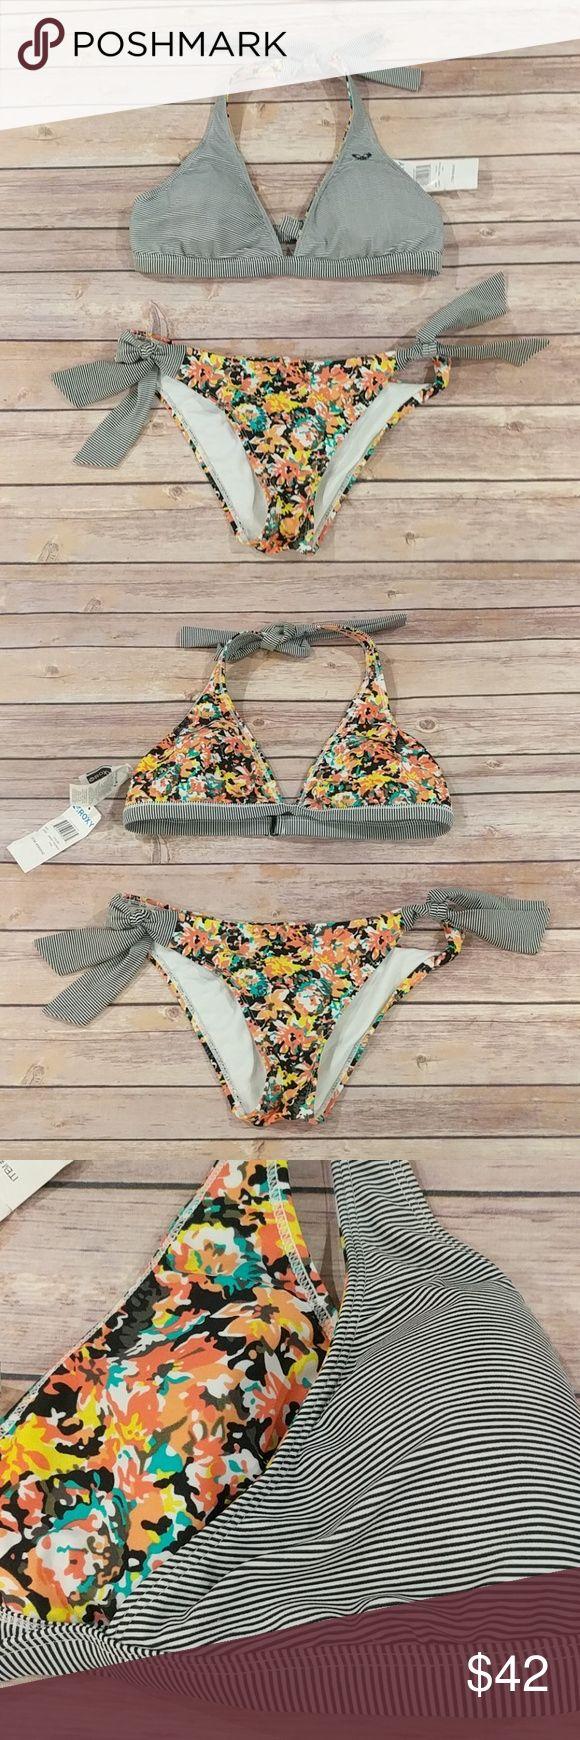 "Roxy reversible bikini top& bottom set ""new"" Never worn, new with tags on bikini top tag. (No bottom tags), beatiful flower & stripe design reversible top bikini set. It's like you own two bikinis!! Size large Roxy Swim Bikinis"